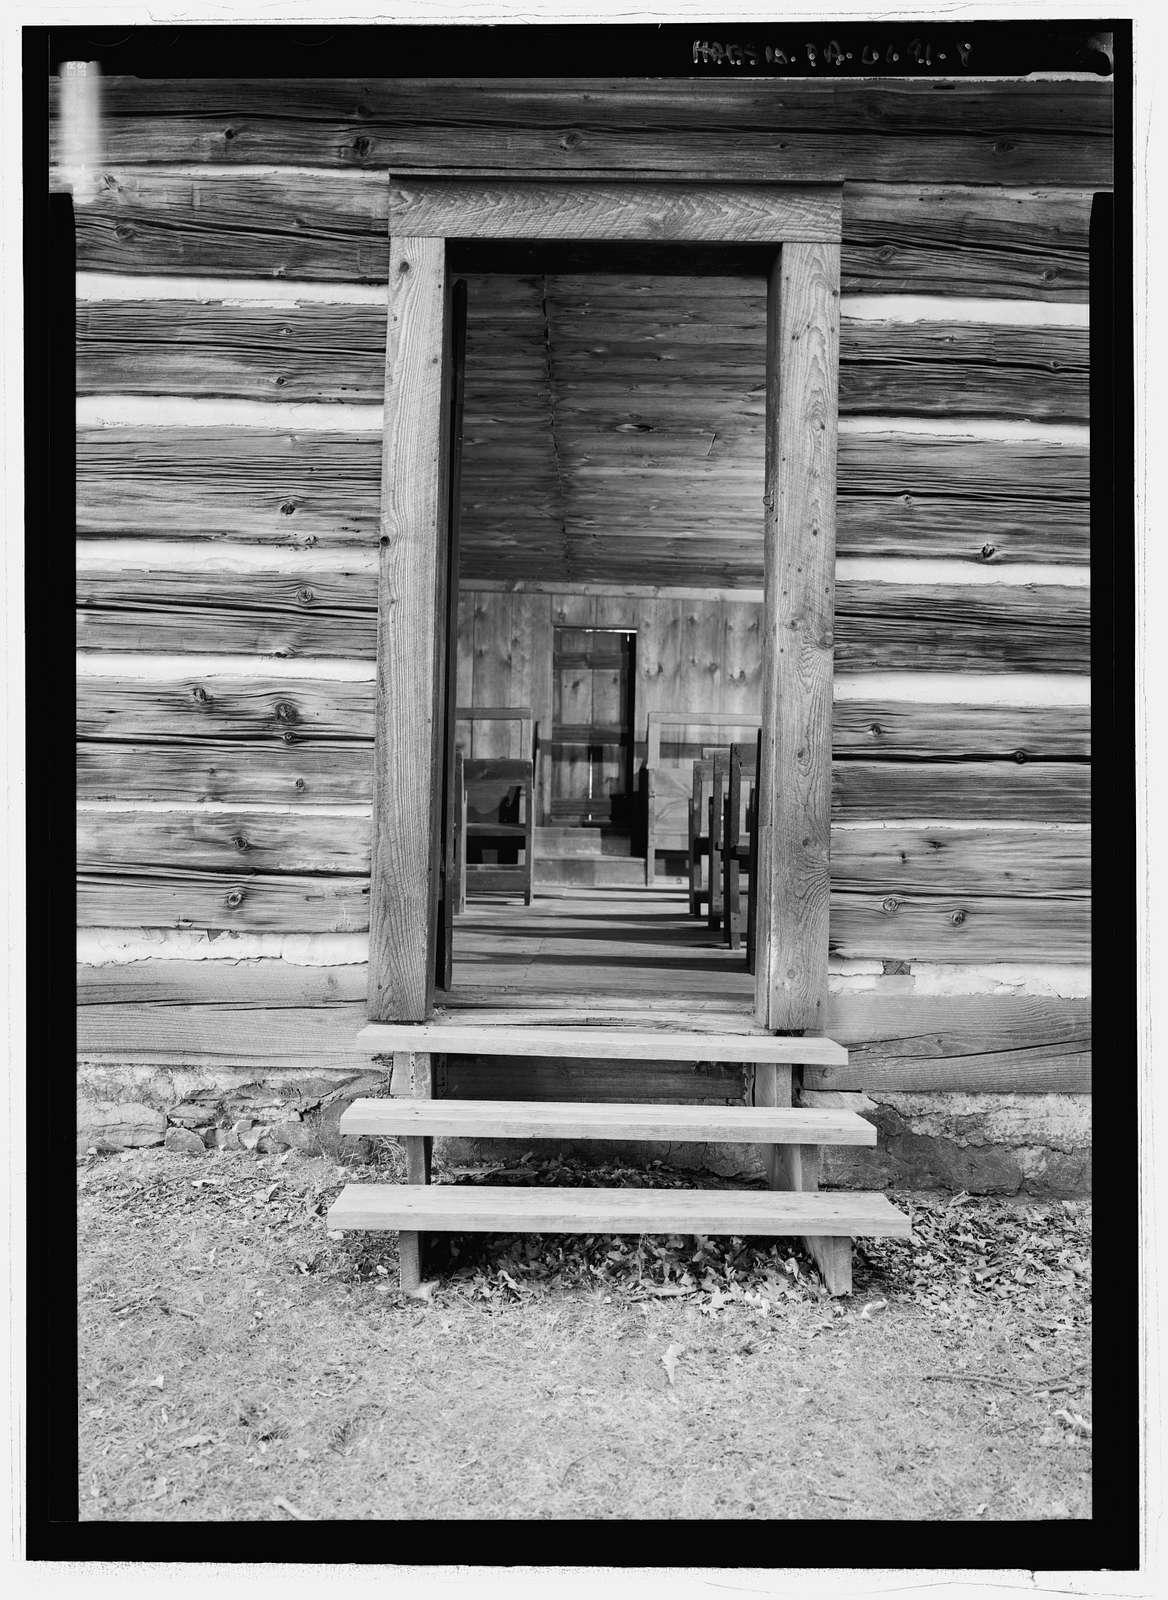 Roaring Creek Friends Meeting House, Quaker Meeting Road, Numidia, Columbia County, PA